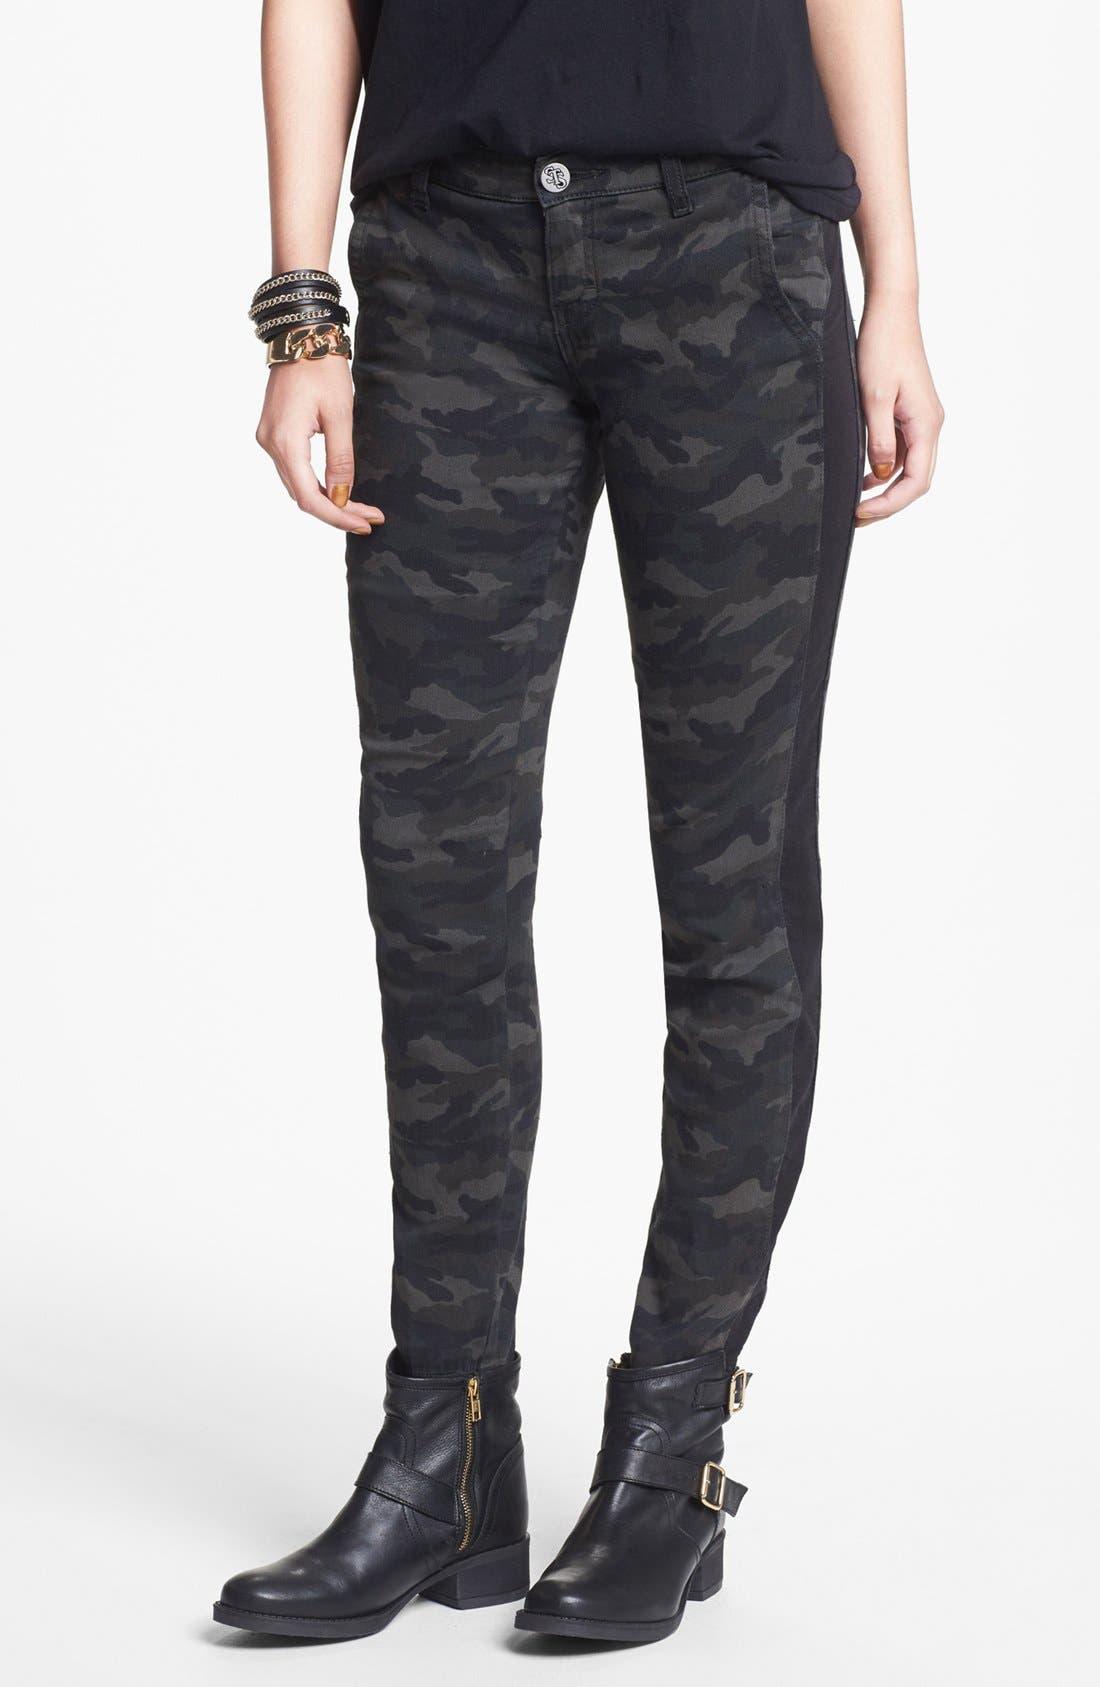 Alternate Image 1 Selected - STS Blue Tuxedo Stripe Camo Print Pants (Juniors)